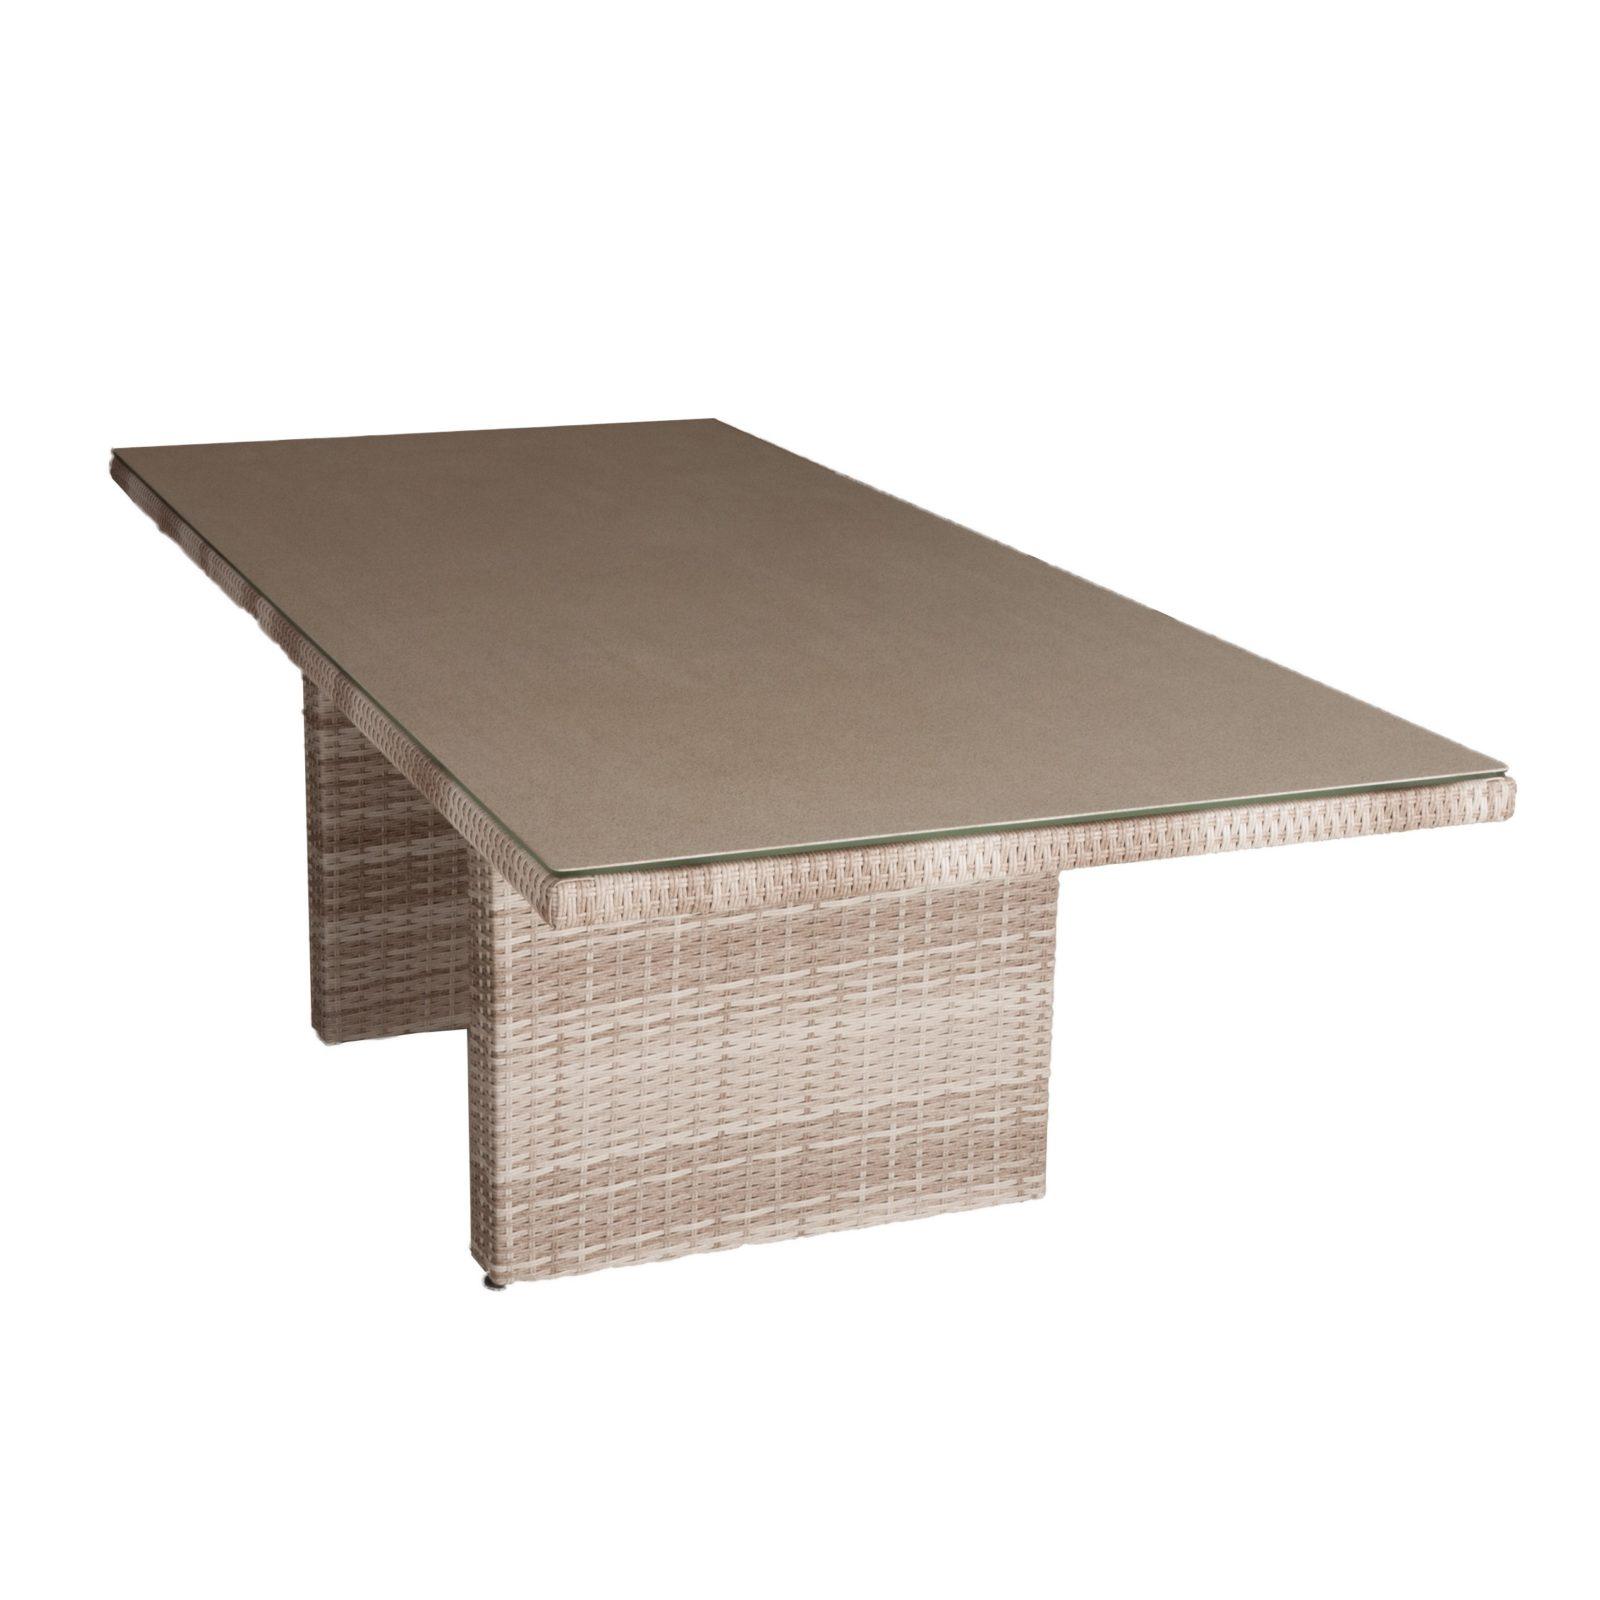 Kansas spisebord 220x100 med spraystone bordplade 21298